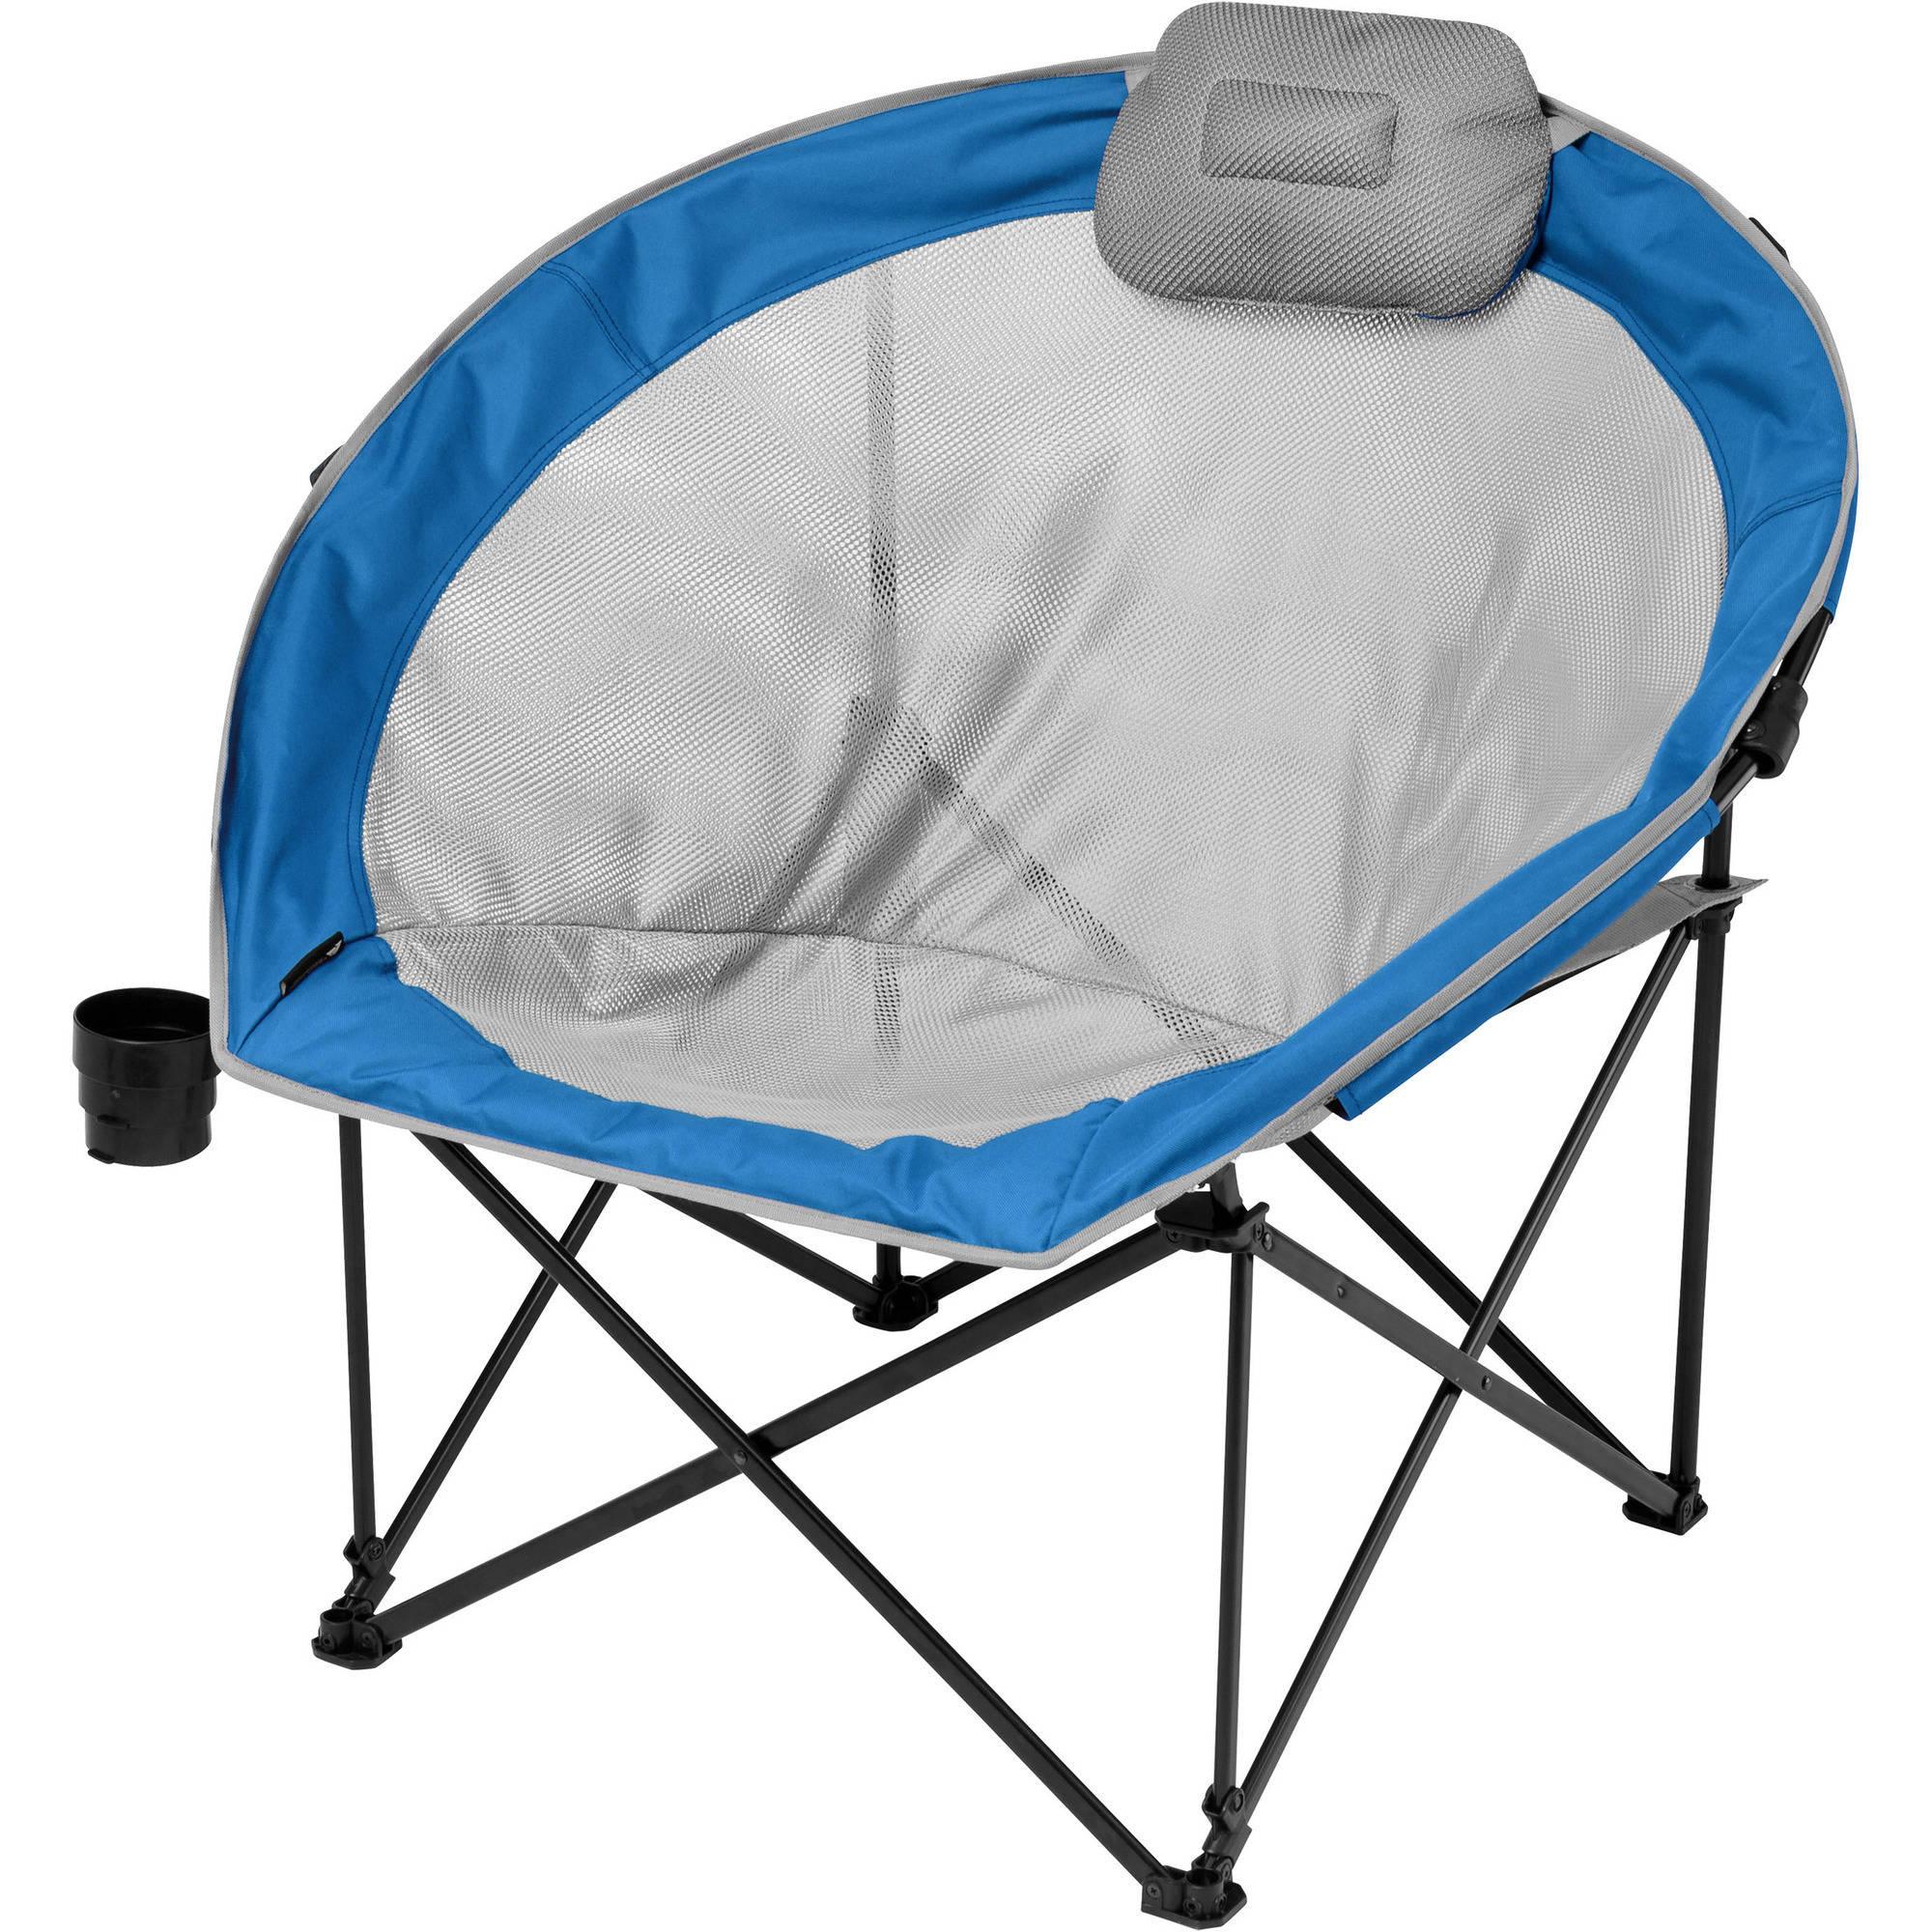 Ozark Trail Oversized Cozy Camp Chair Blue Walmart Com